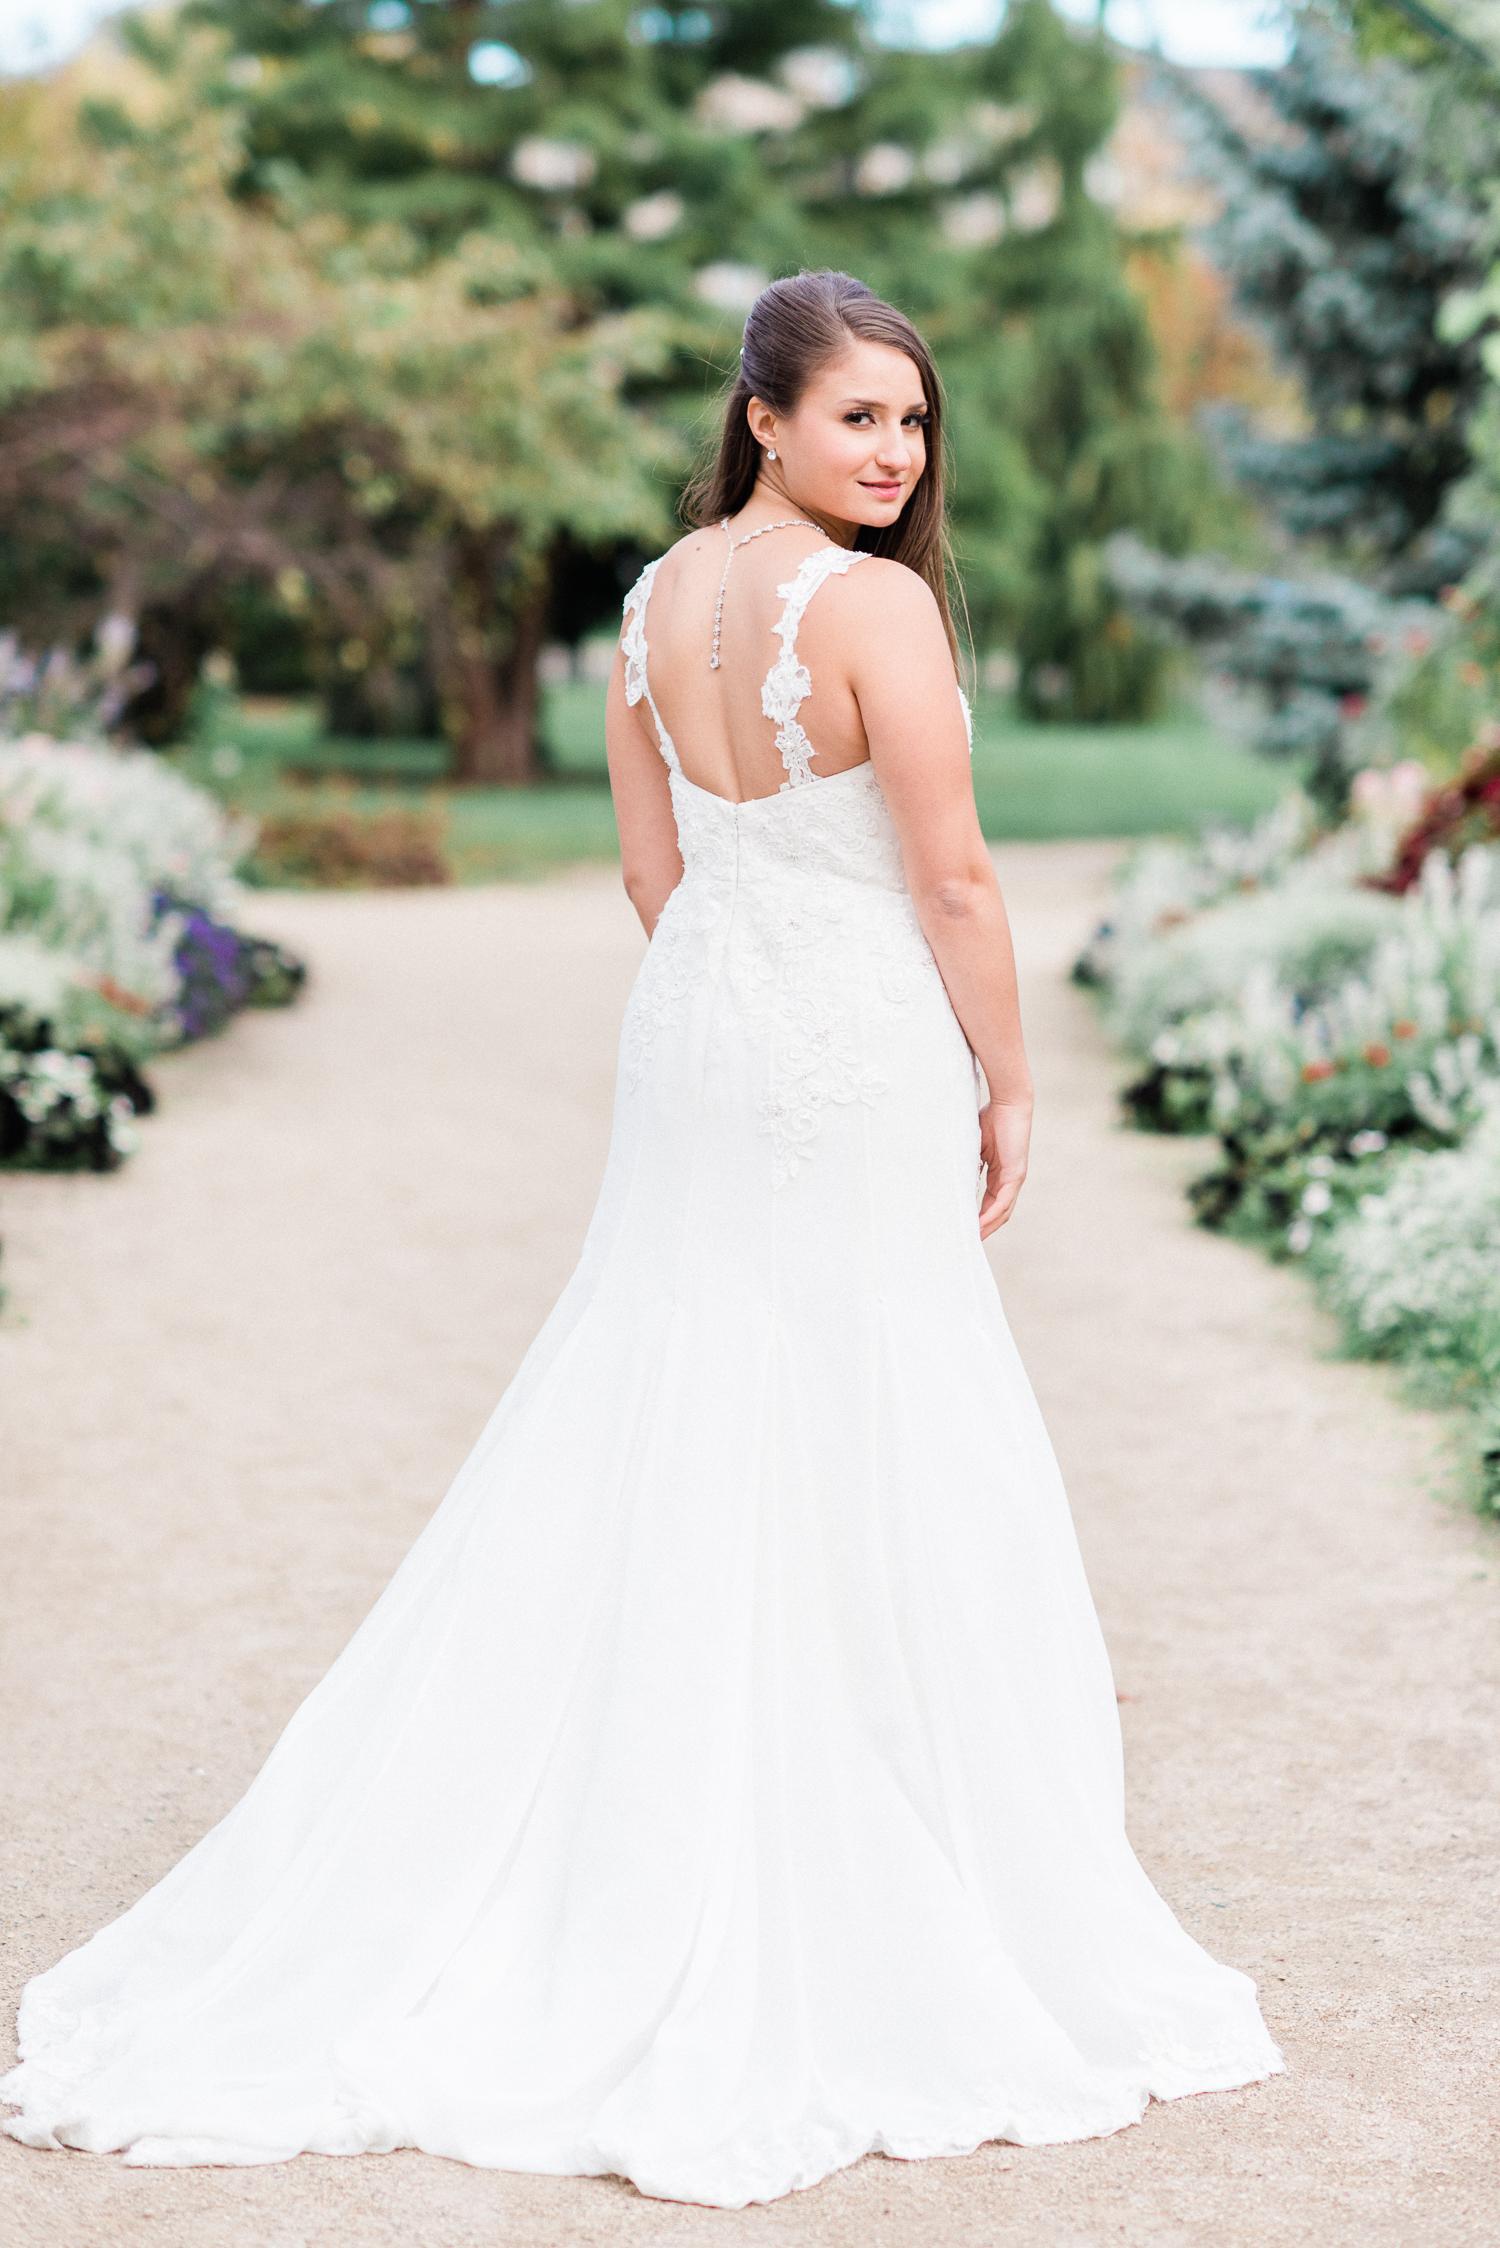 Brittany Bekas - Garfield Park Conservatory Chicago Wedding Photos-13.jpg